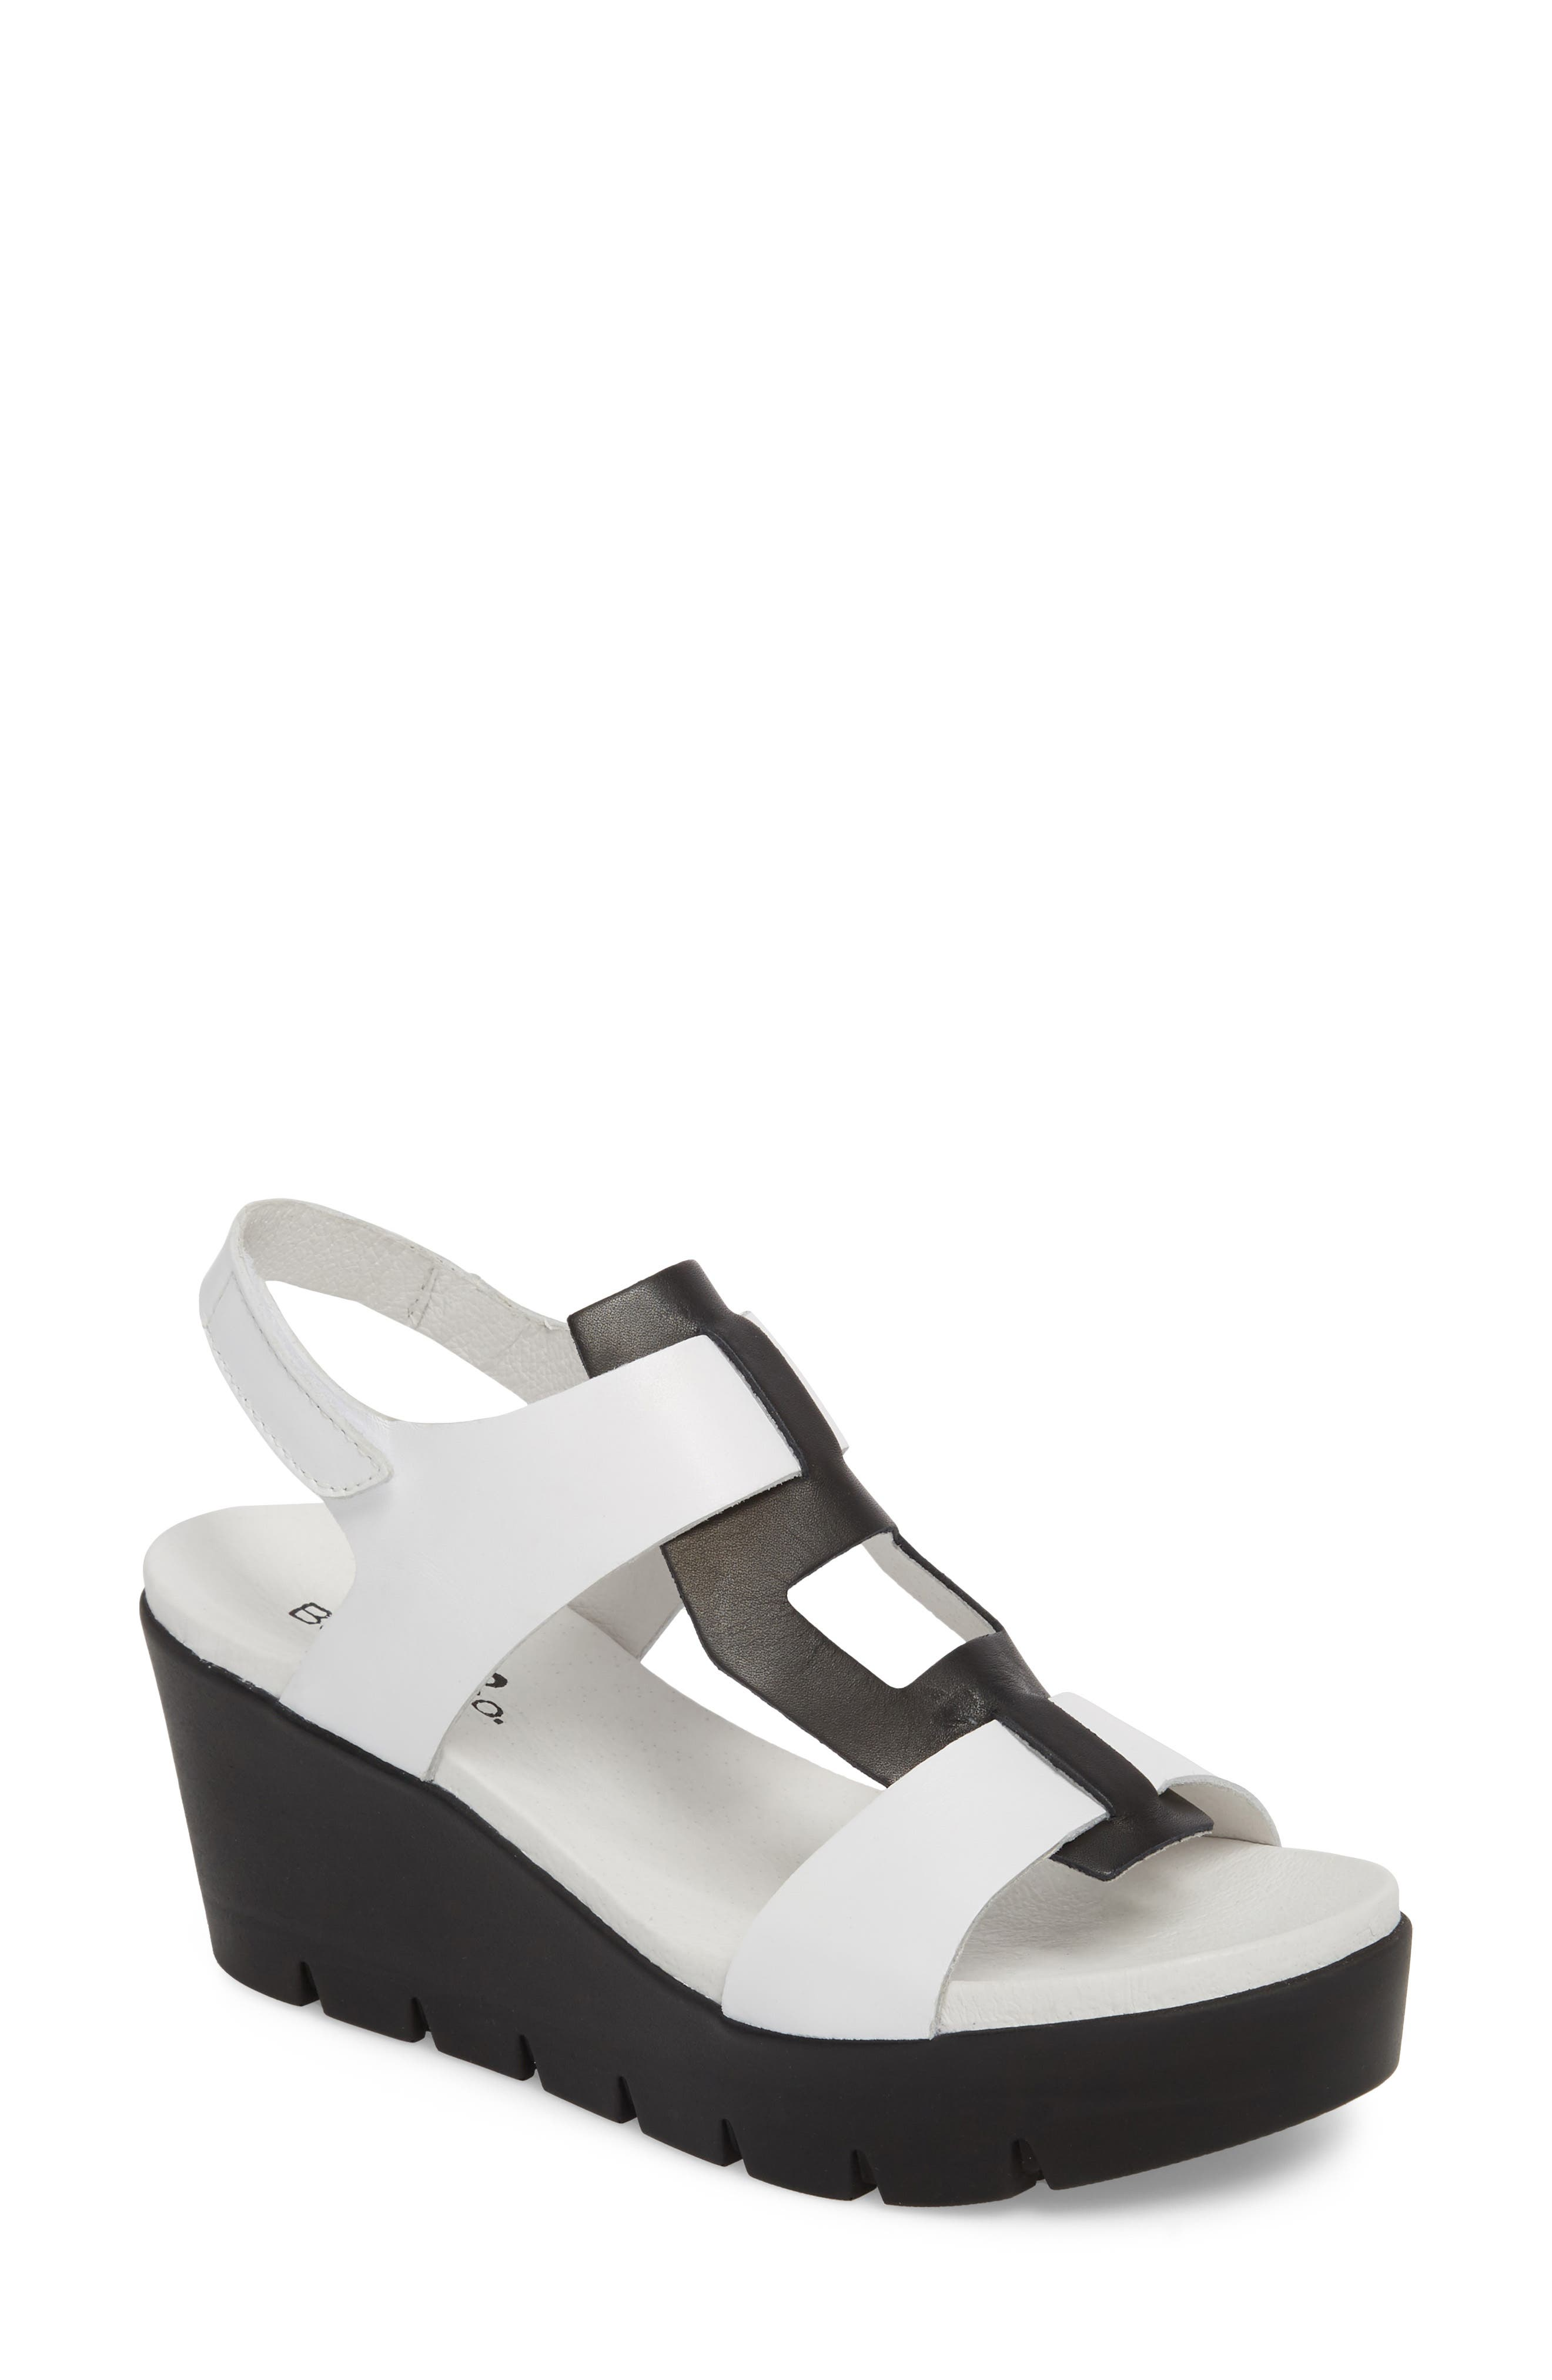 Bos. & Co. Somo Platform Wedge Sandal - White